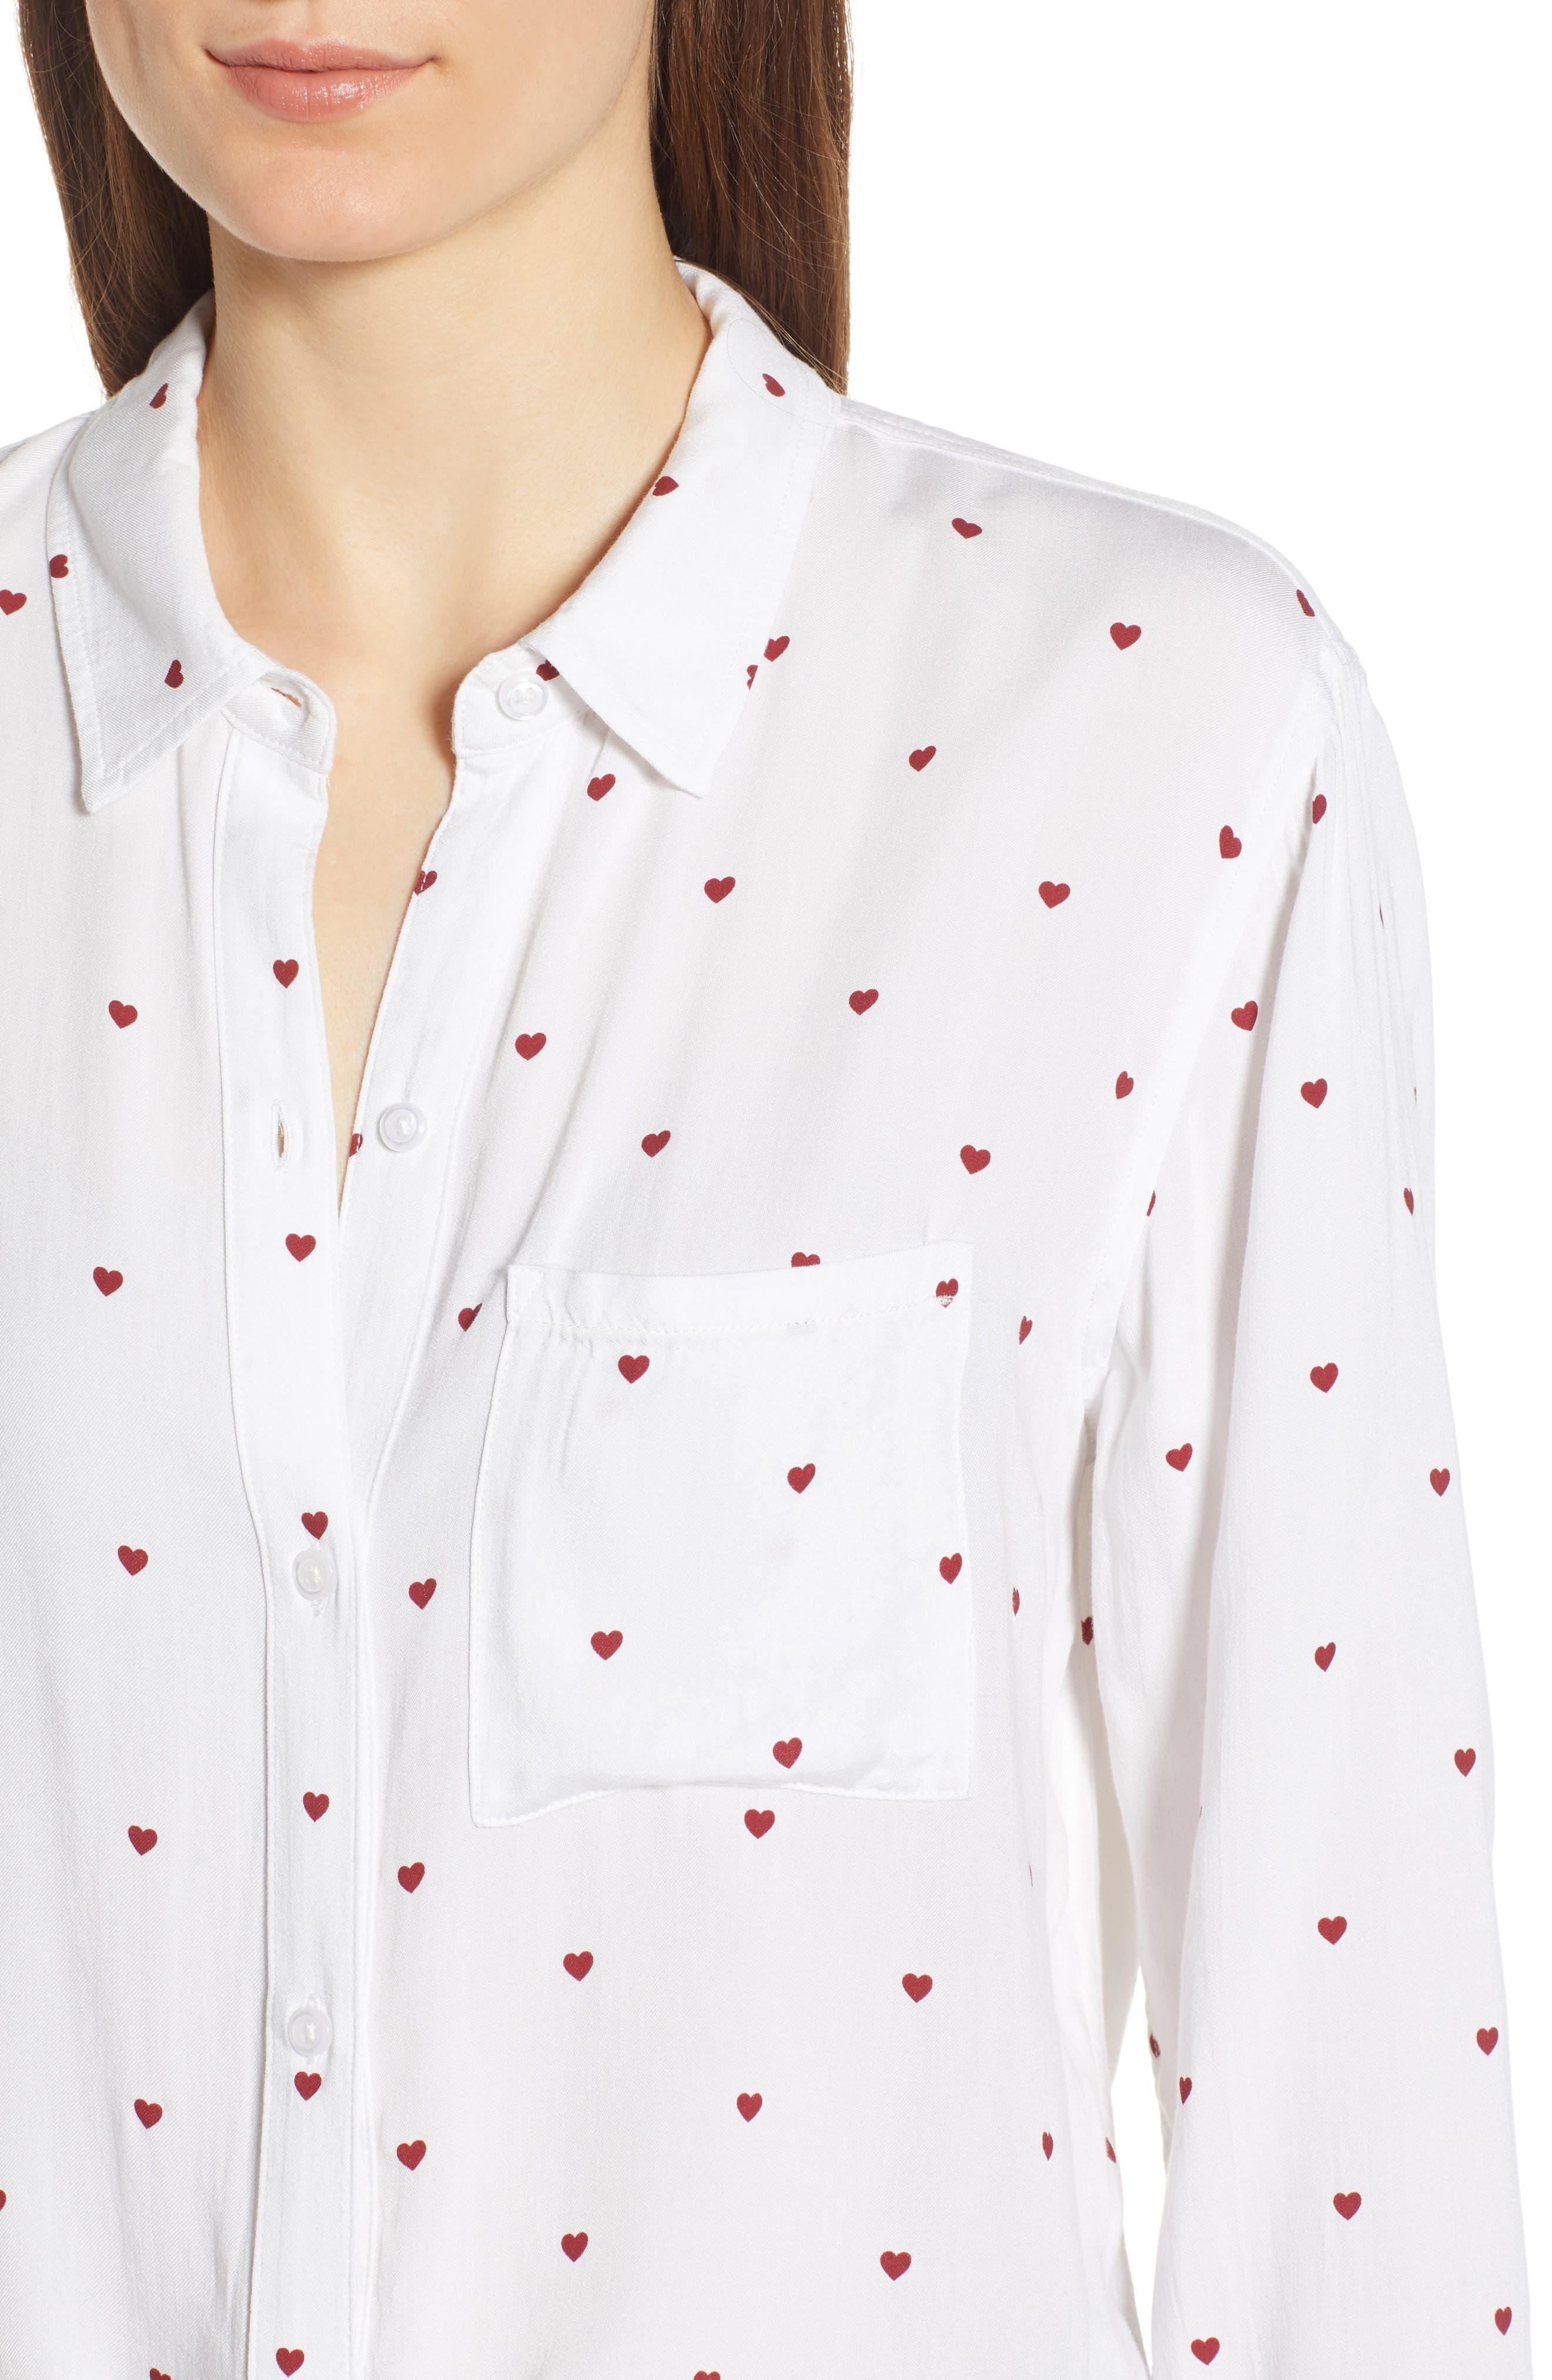 Rocsi Heart Print Shirt,                             Alternate thumbnail 4, color,                             WHITE RED HEARTS